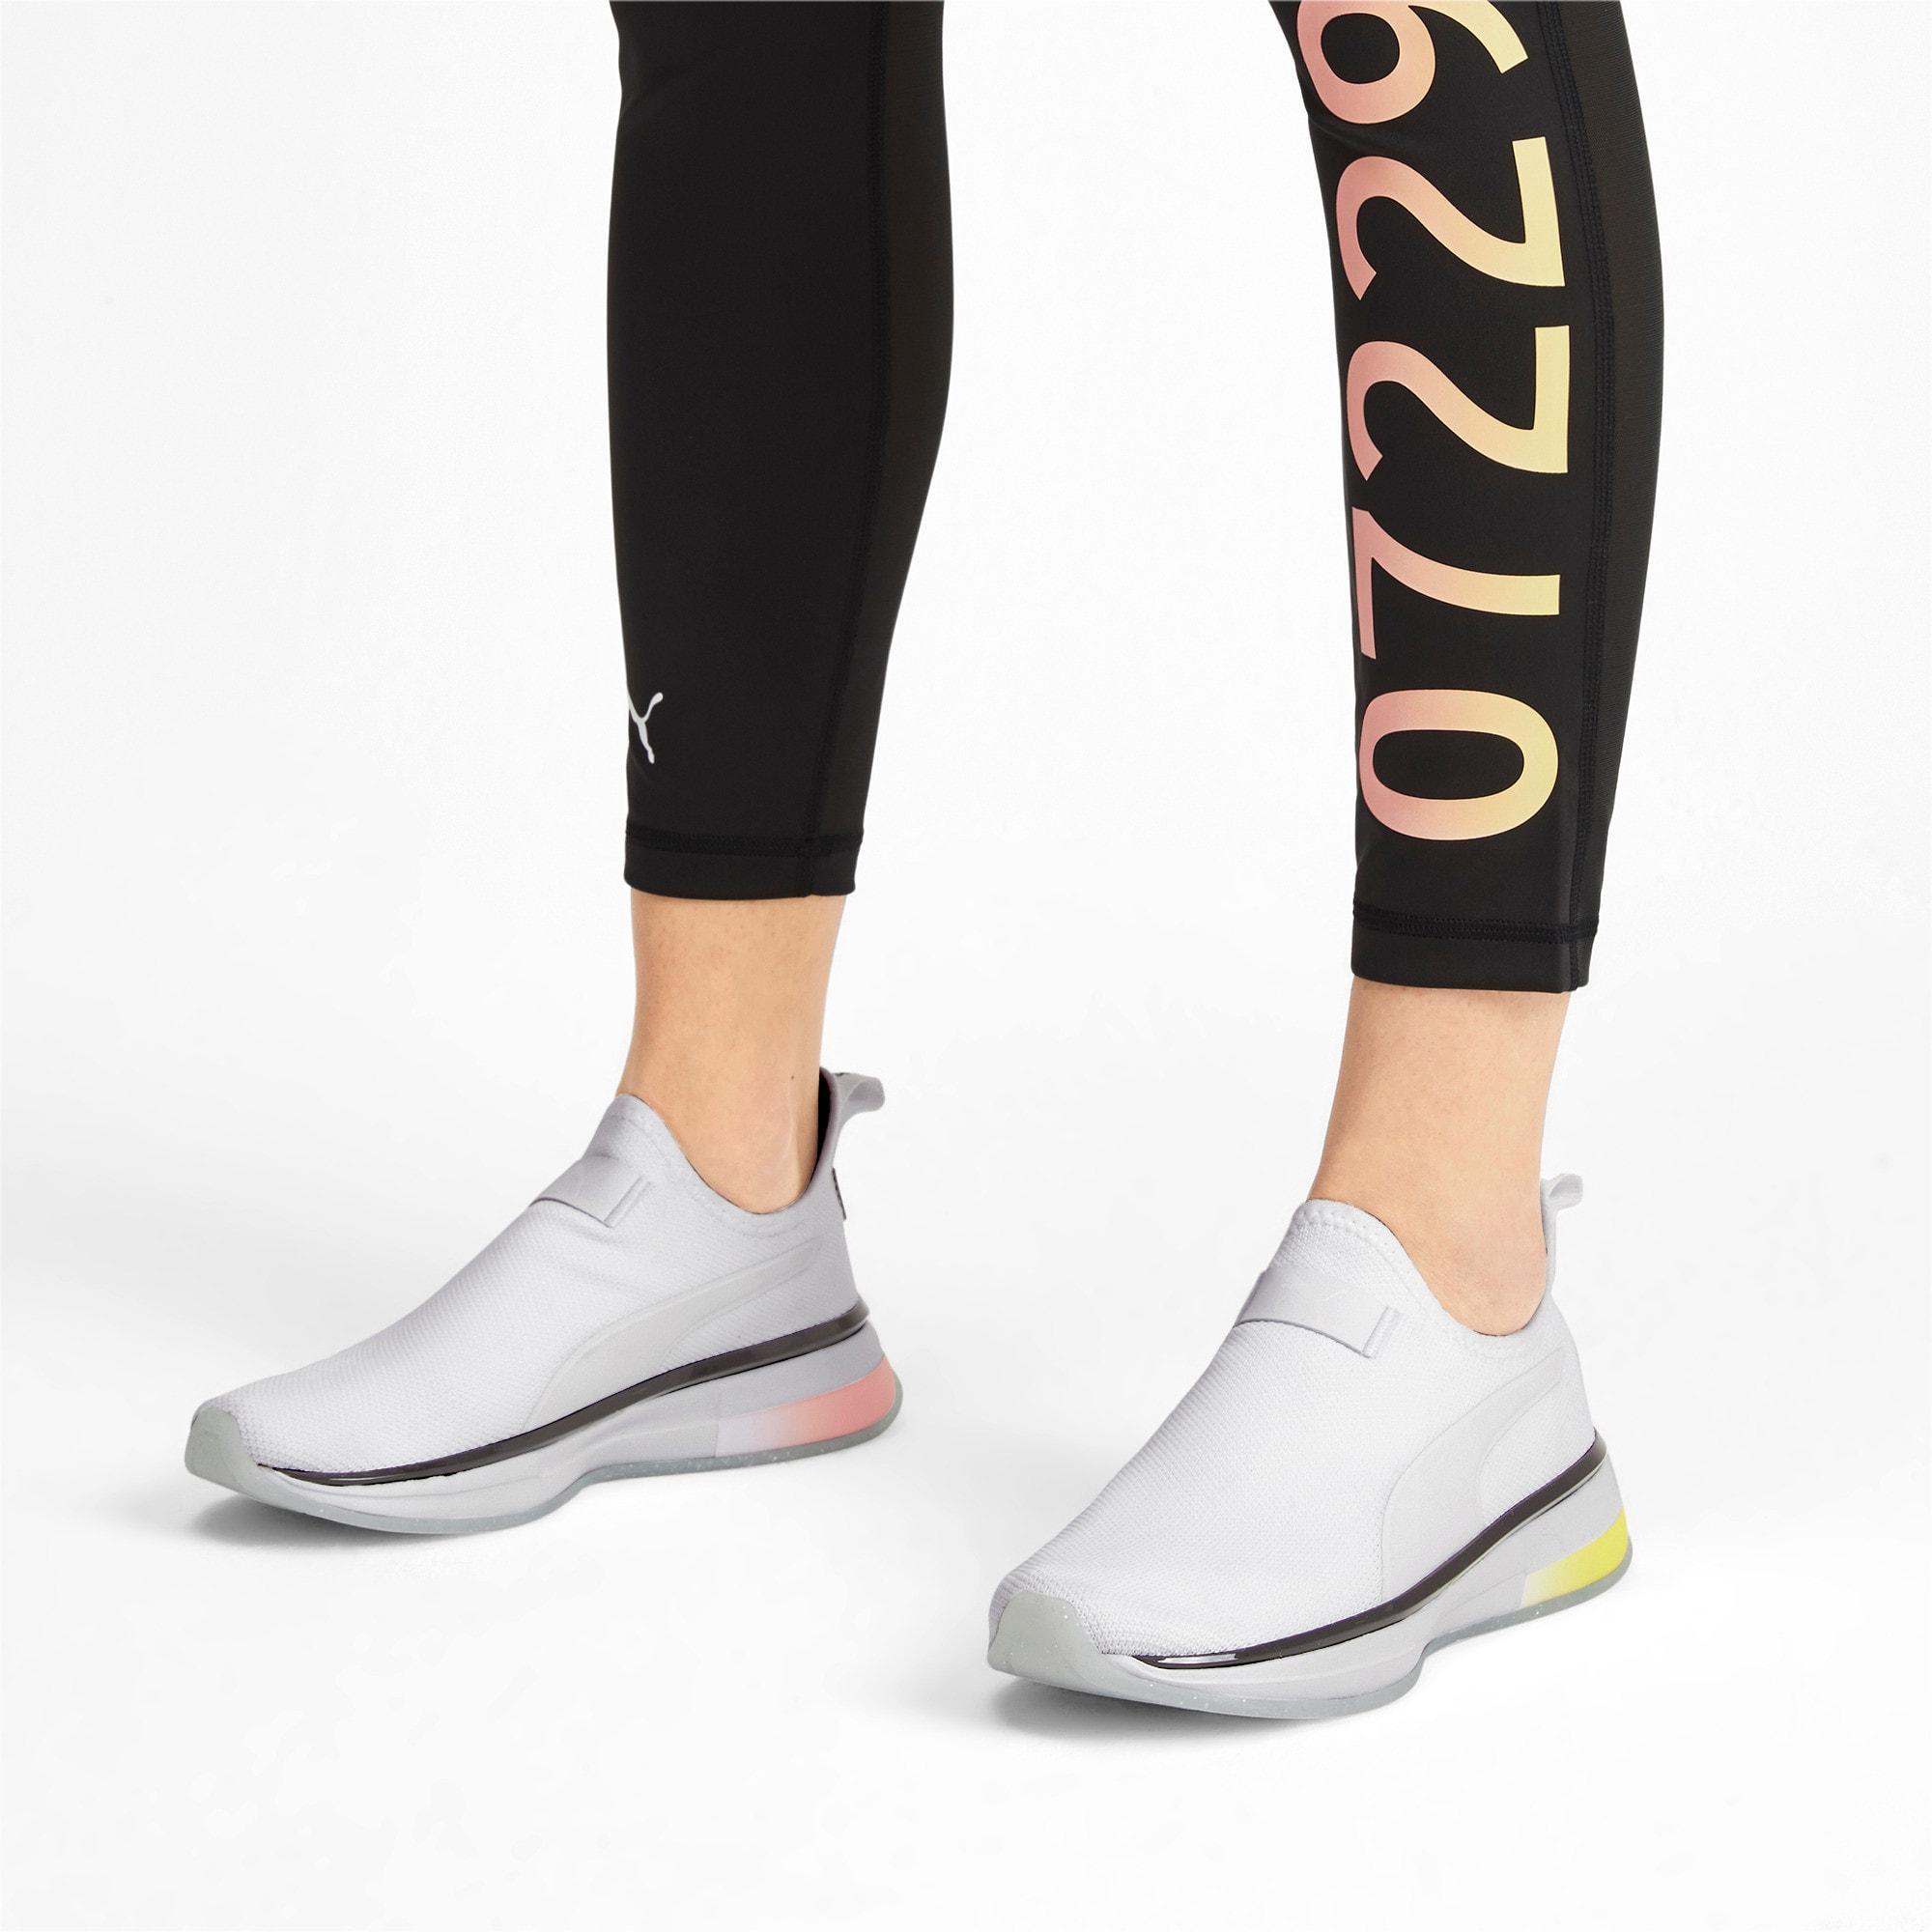 Thumbnail 2 of SG Slip-On Glitz Women's Training Shoes, Puma White-Puma Black, medium